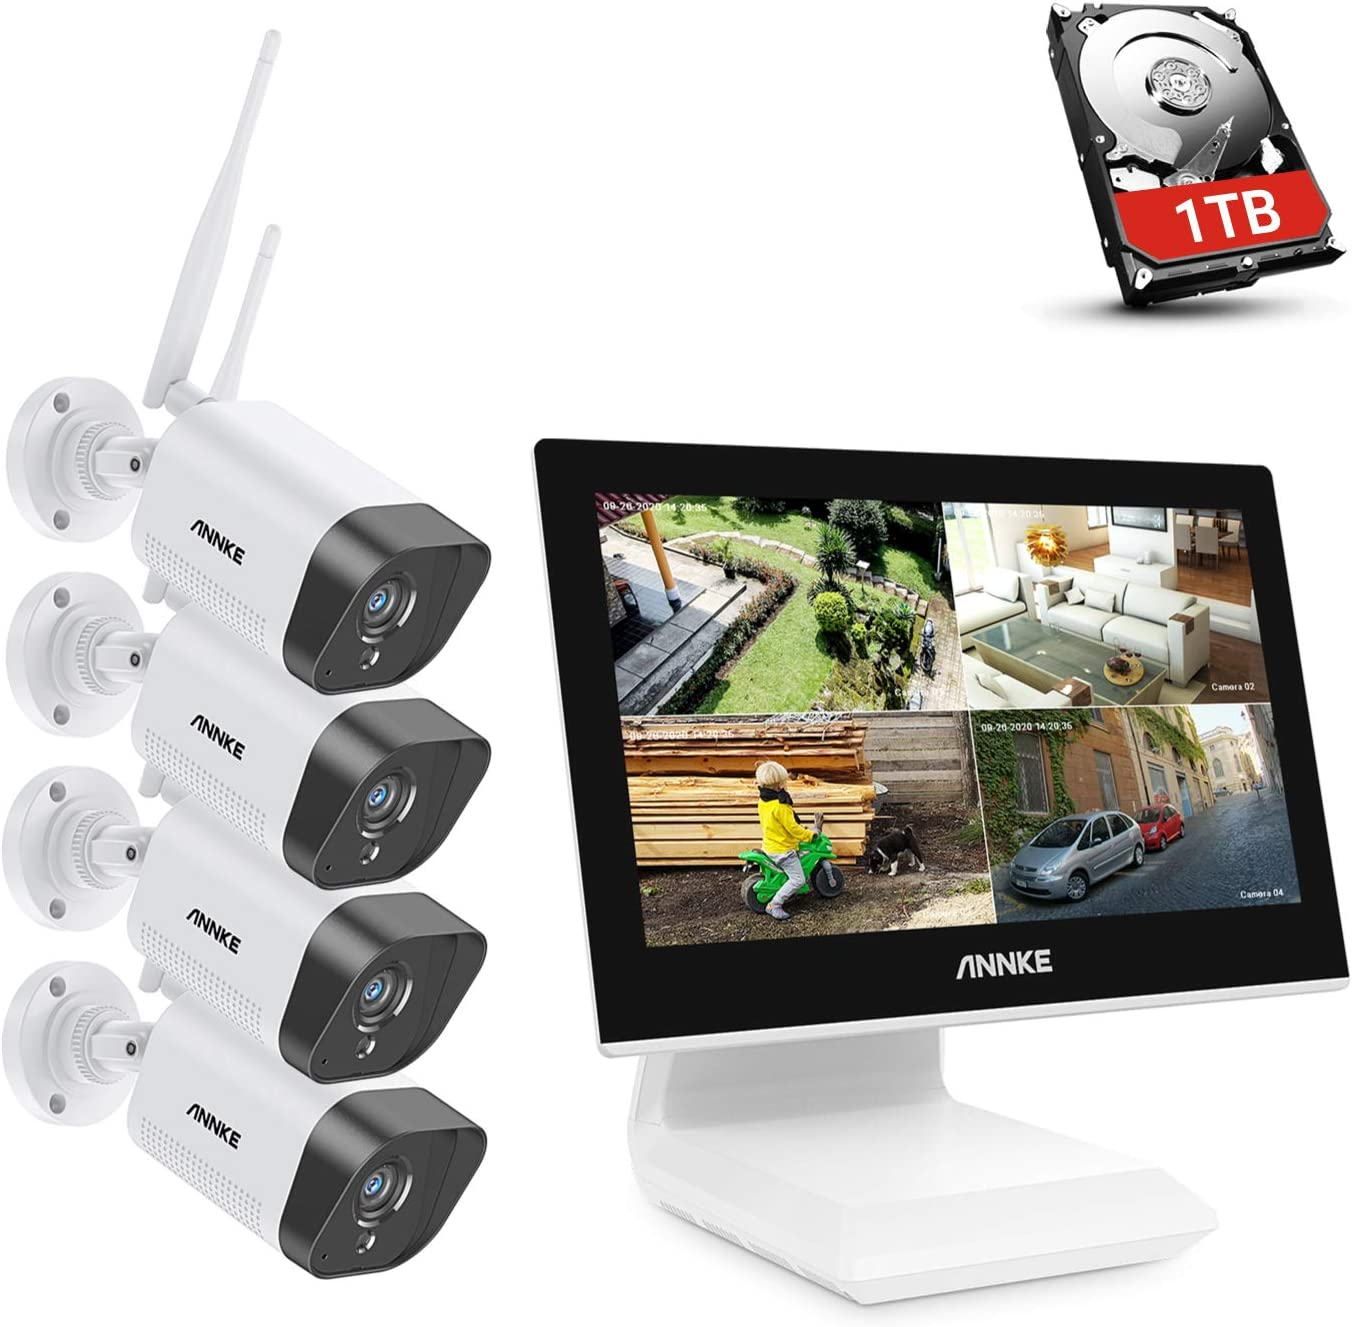 ANNKE WLAN ÜberwachungsKamera 5MP NVR Mit Mikrofon 1080P Kameras Monitor Motion